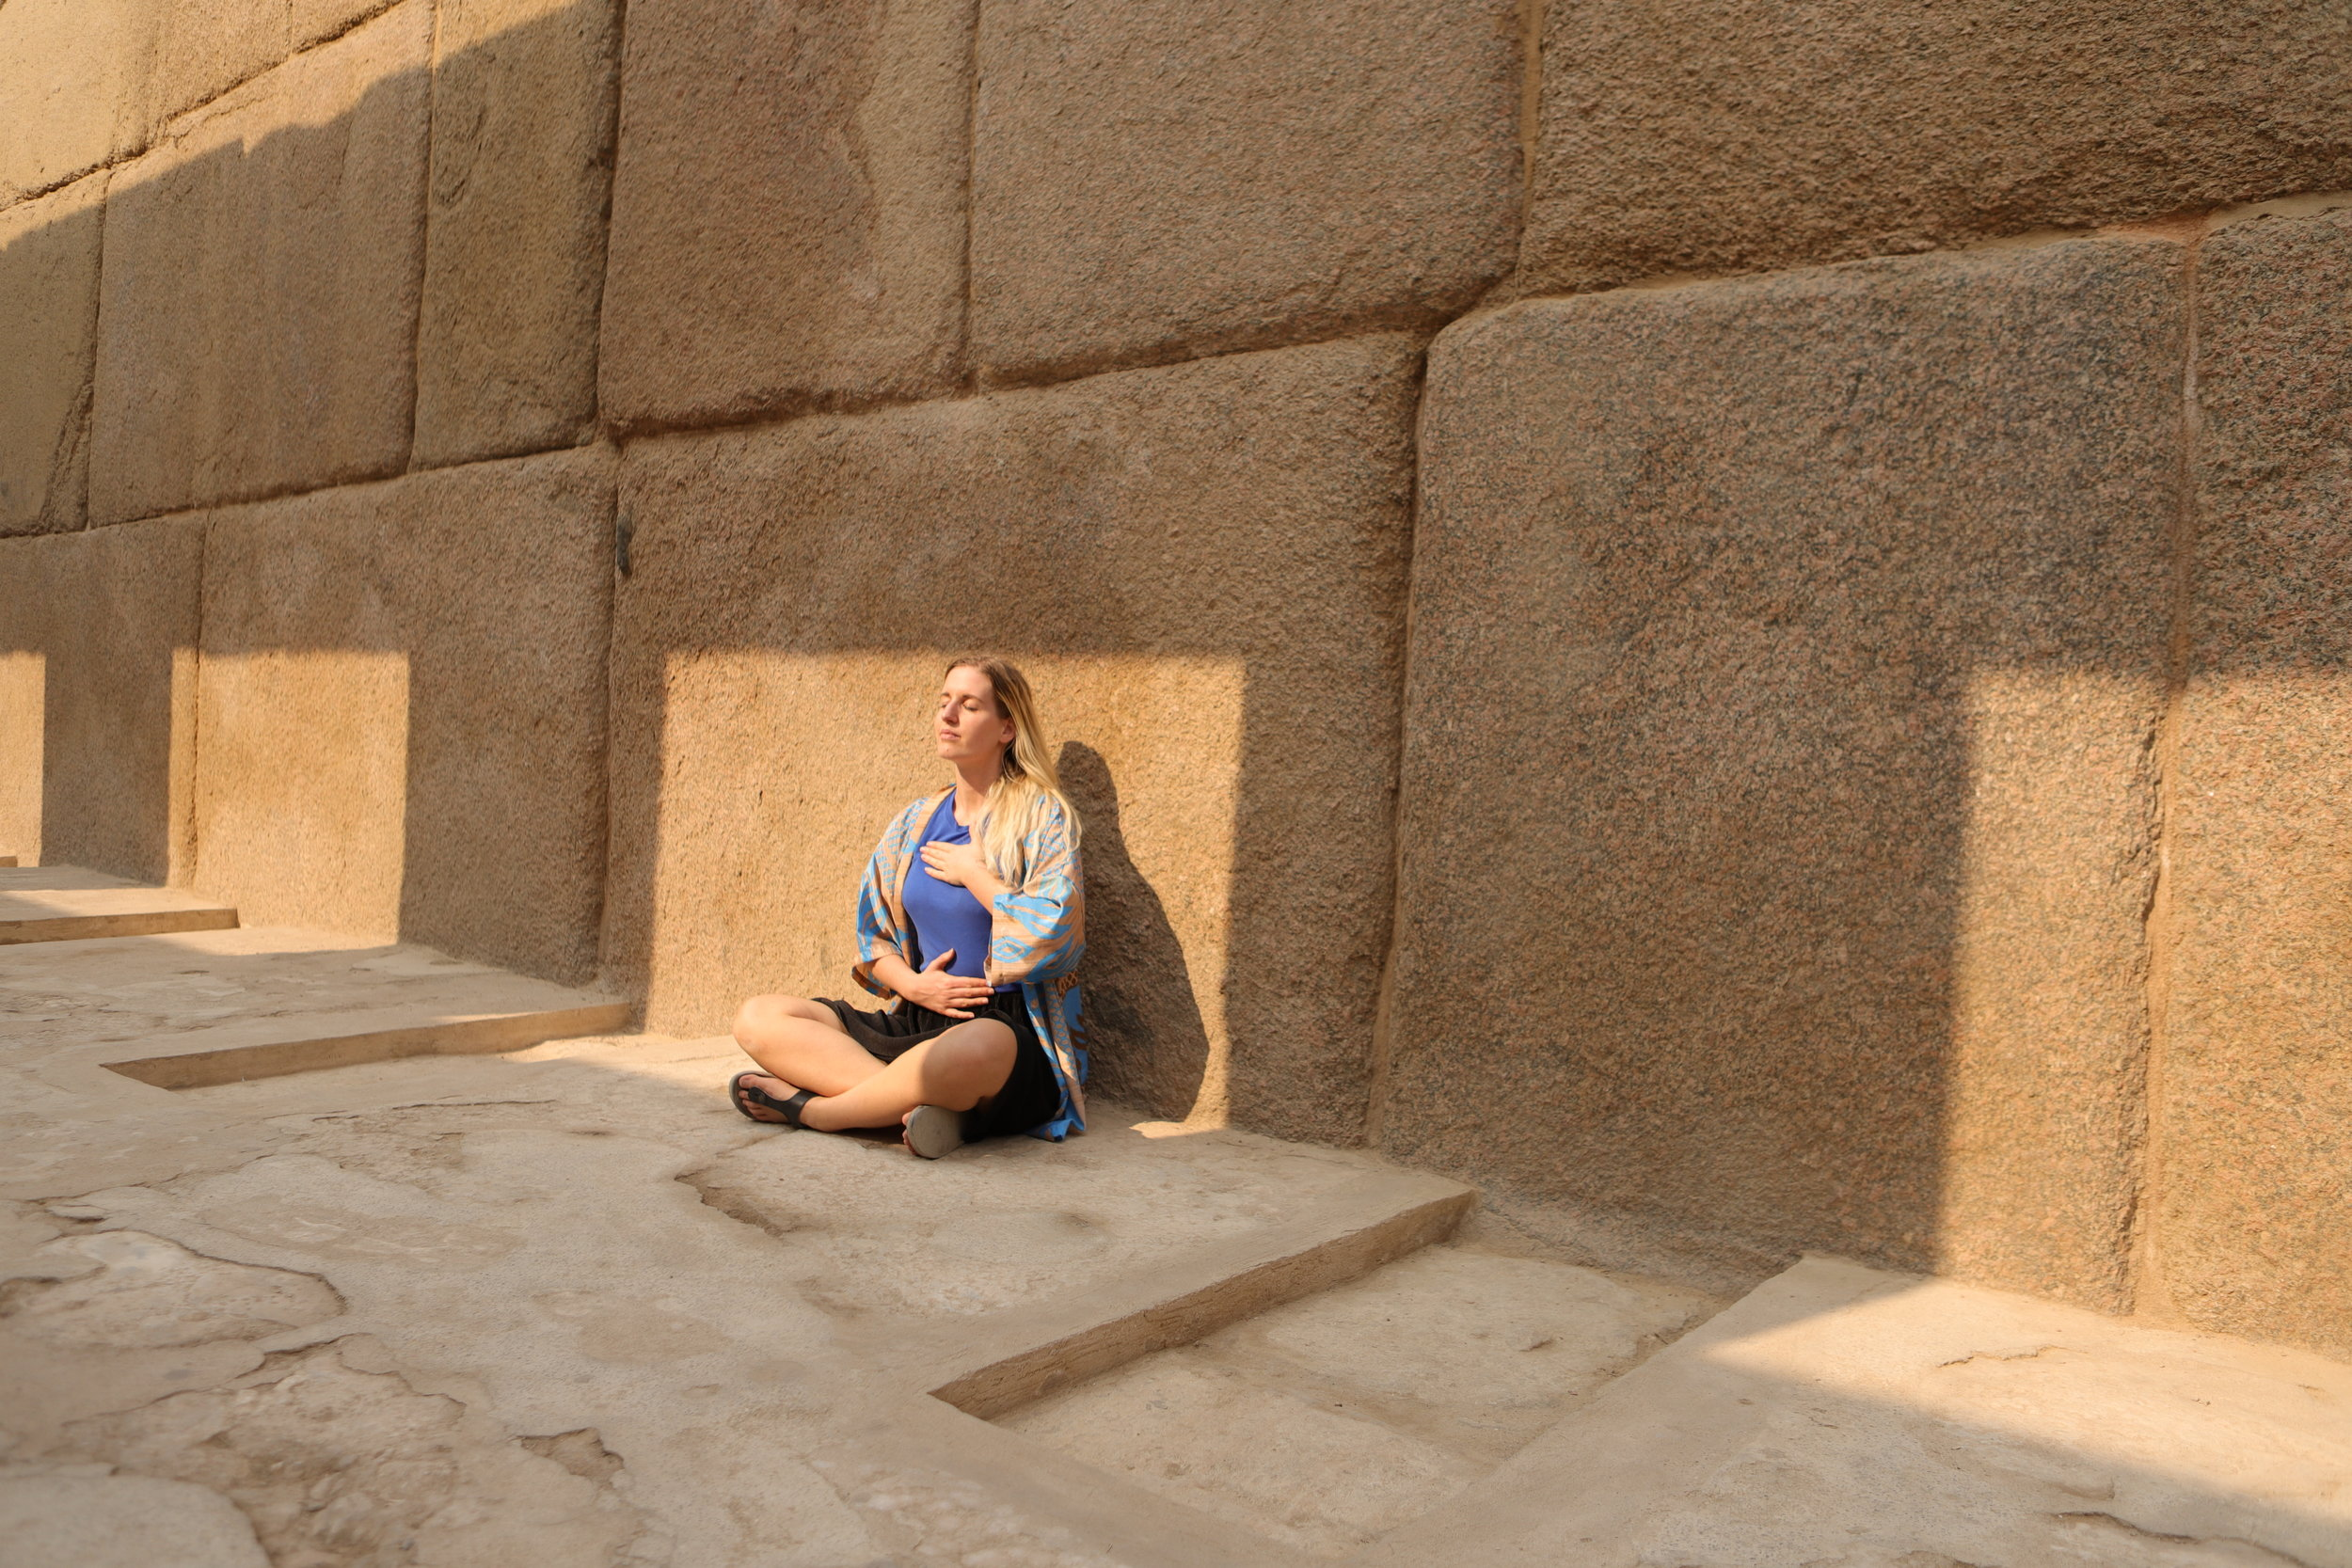 knust hjerte kundalini yoga kærestesorger sorg meditation mantra